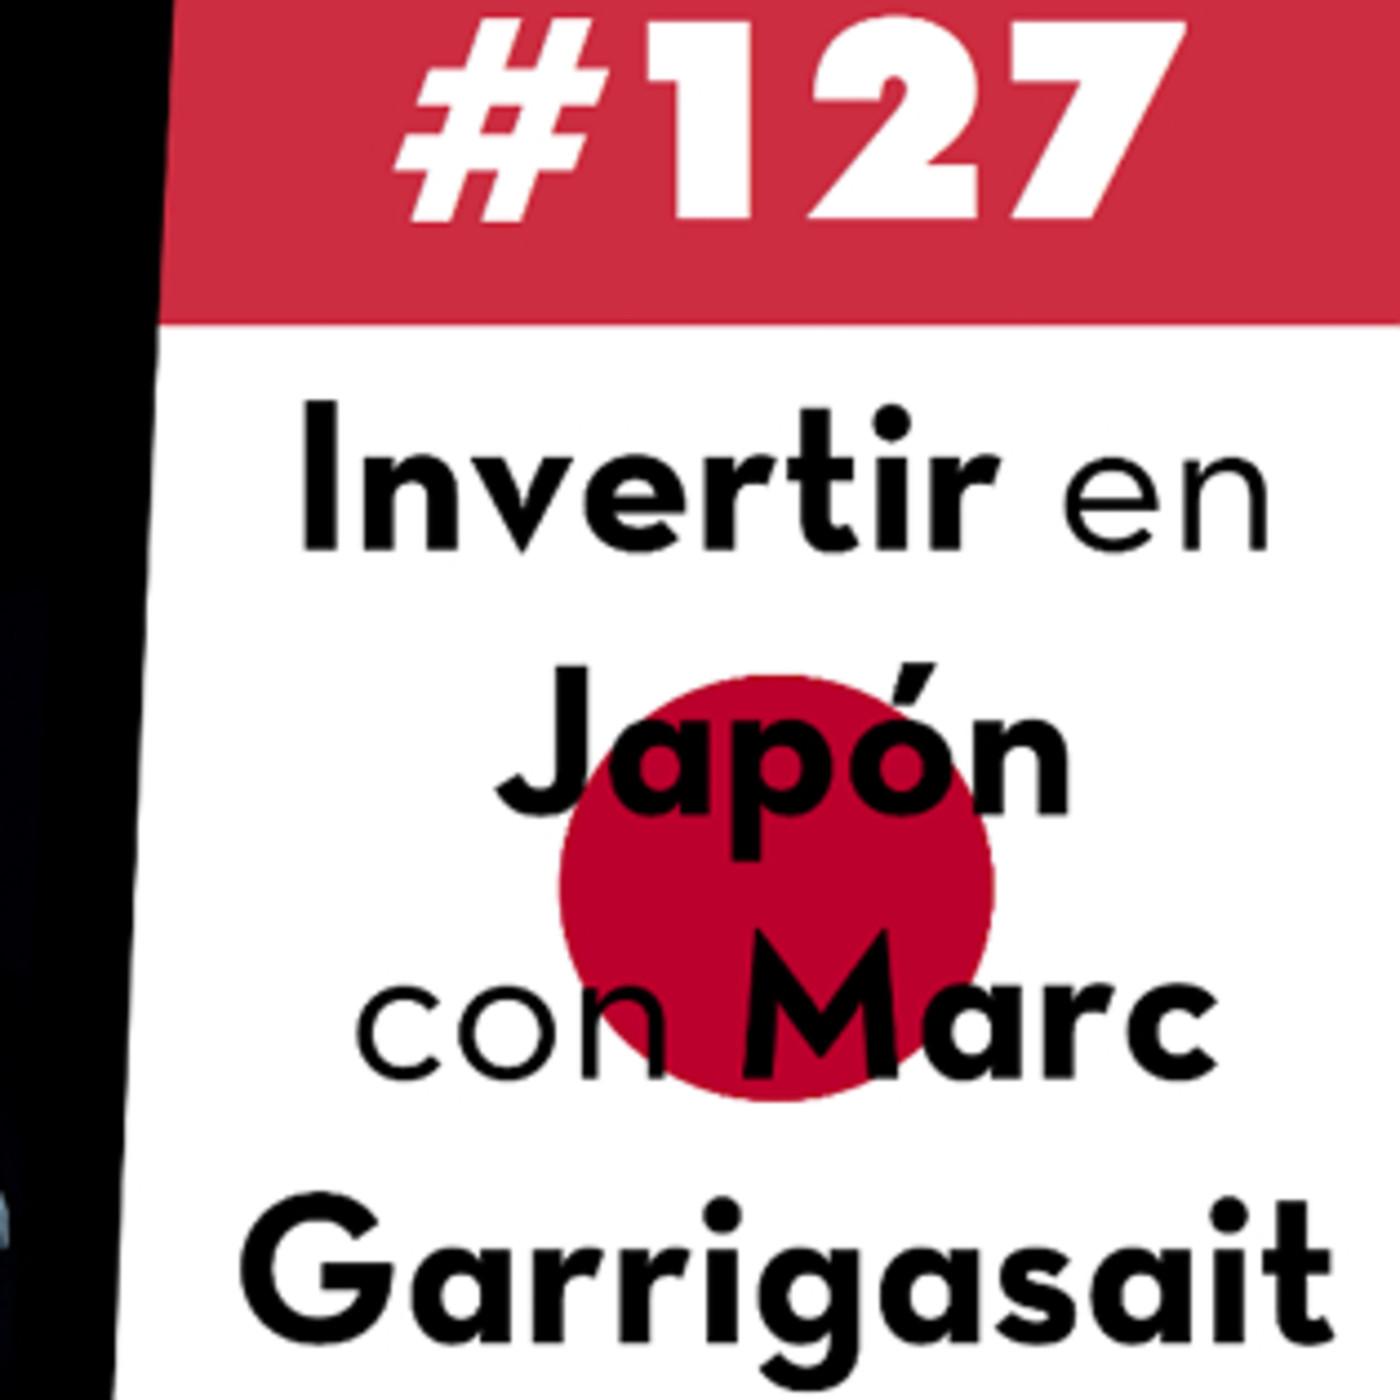 127. Invertir en Japón con Marc Garrigasait